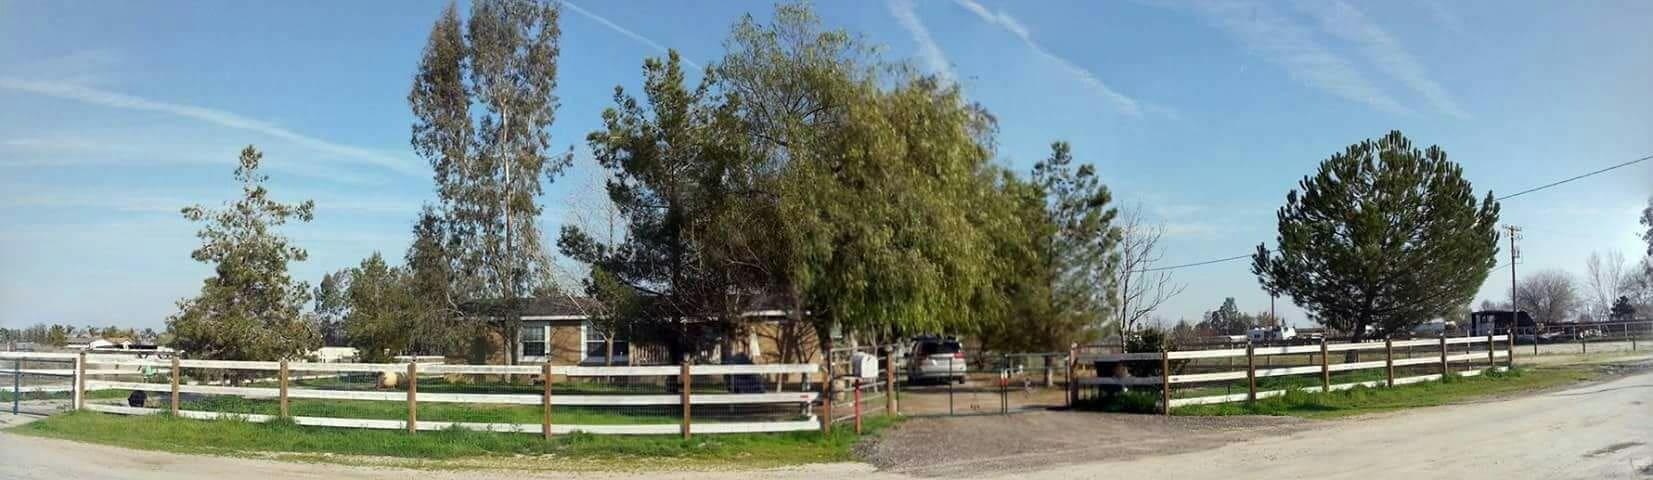 Relax & Welcome to El Rancho de Immanuel